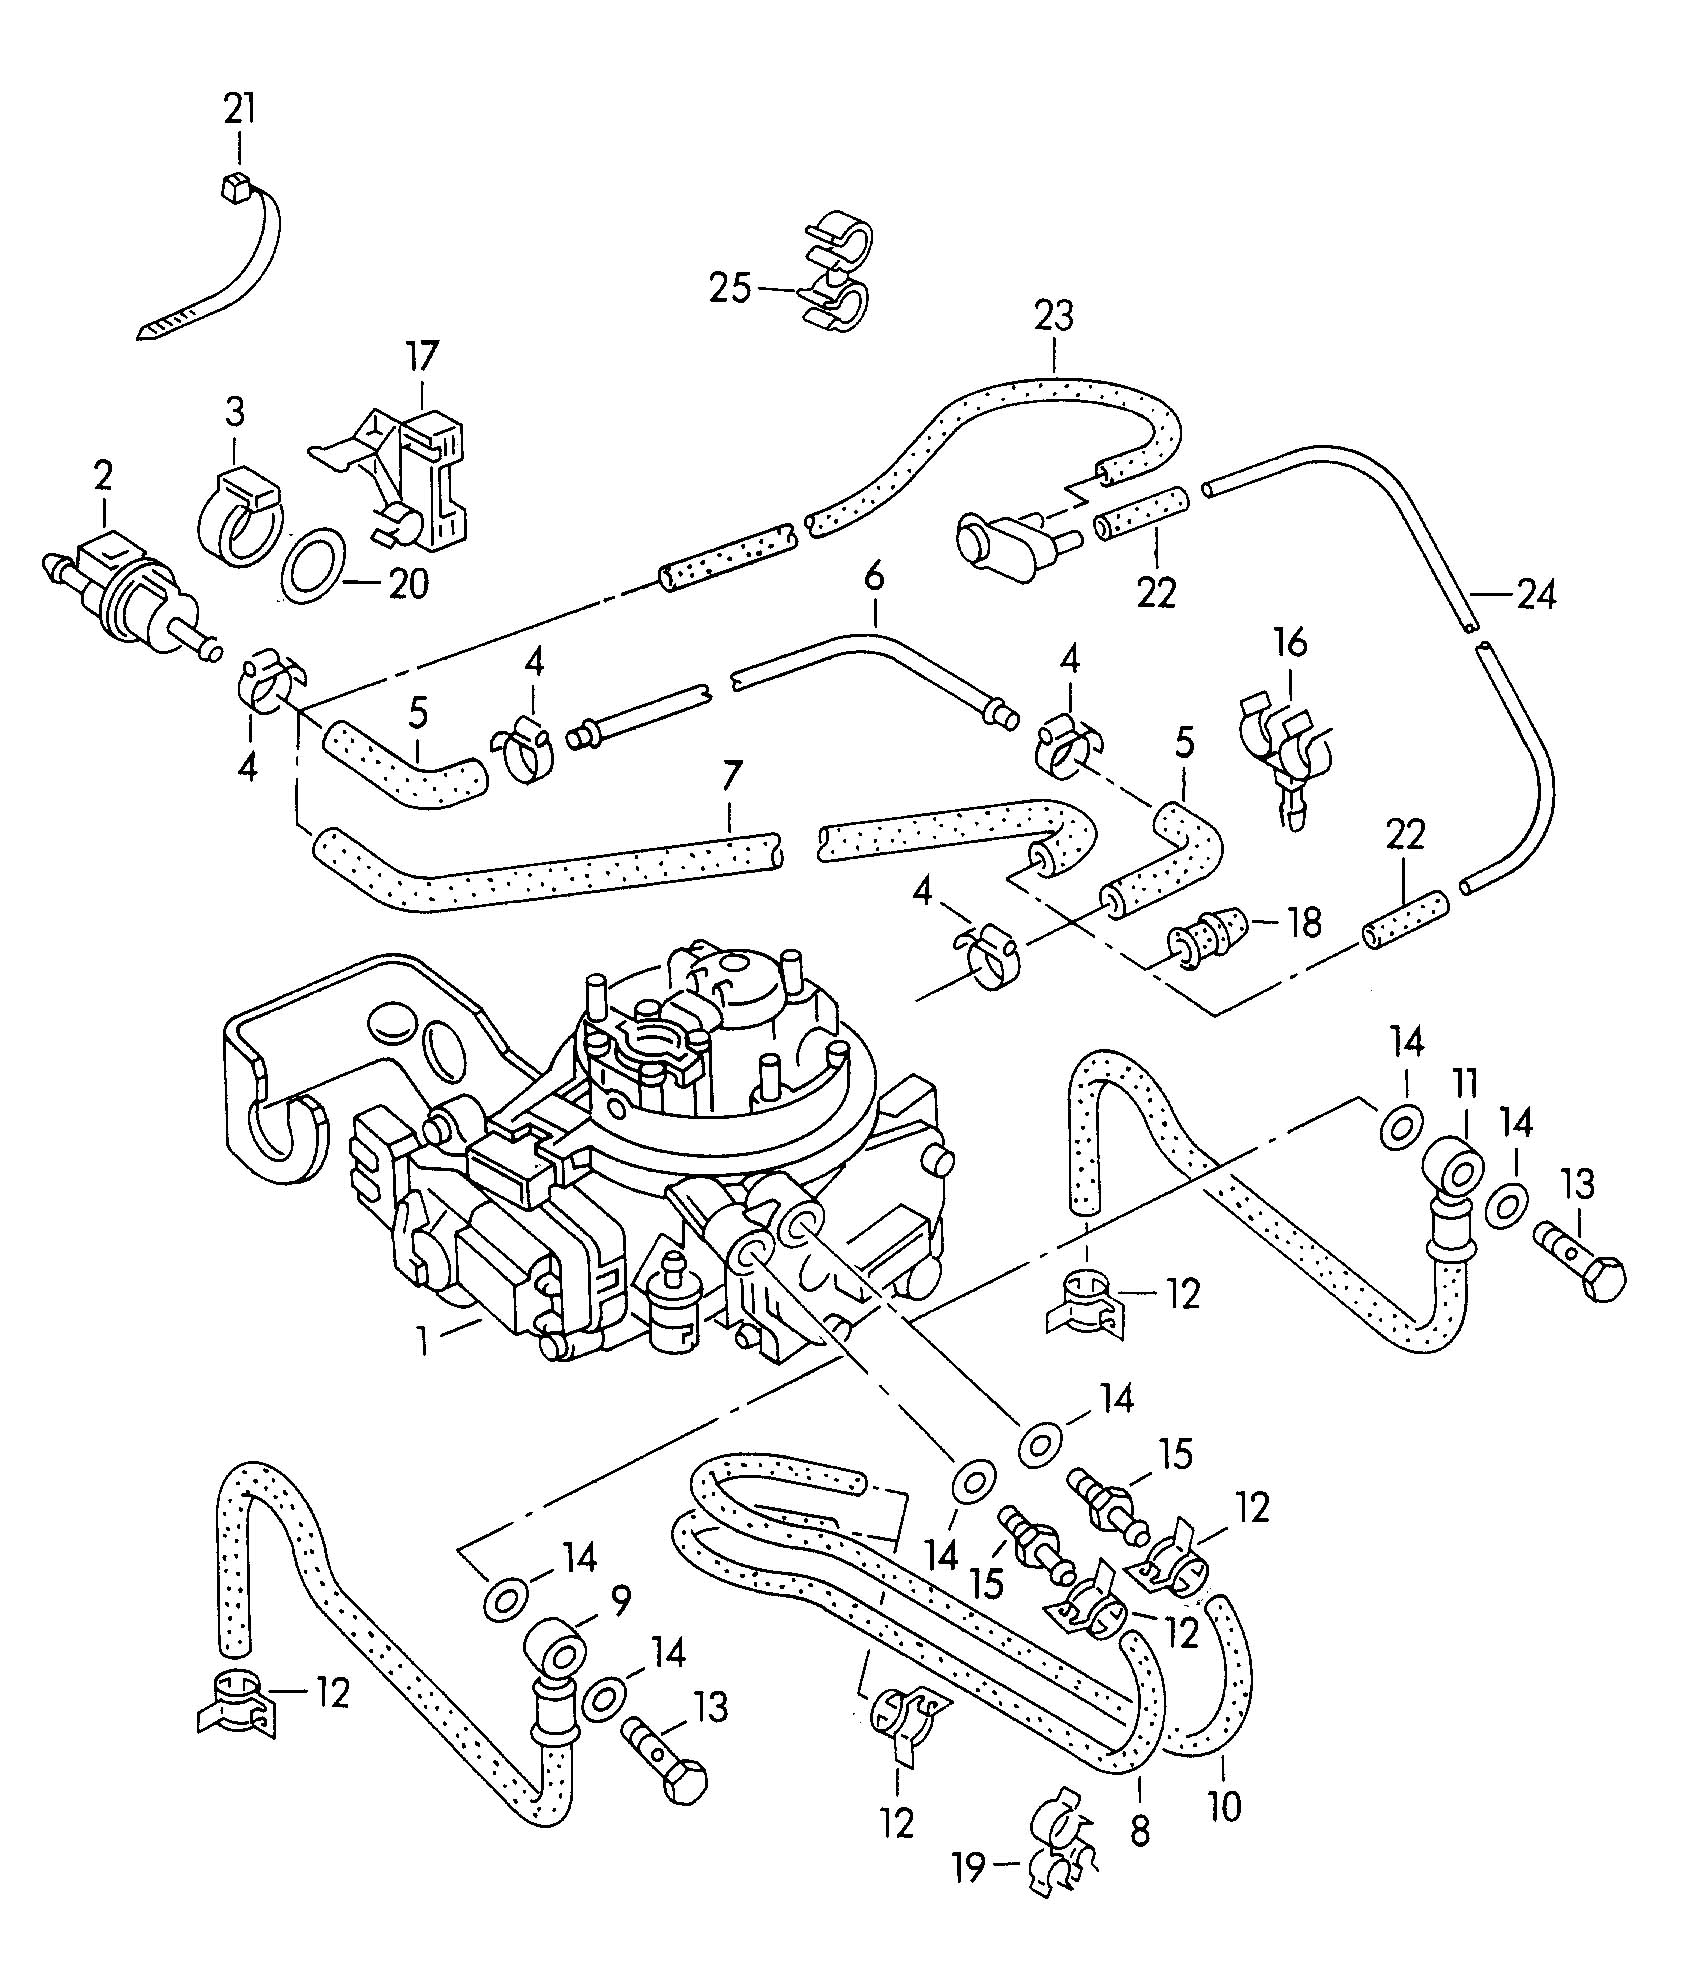 1993 Volkswagen Golf Vacuum system fuel line 1.8ltr.